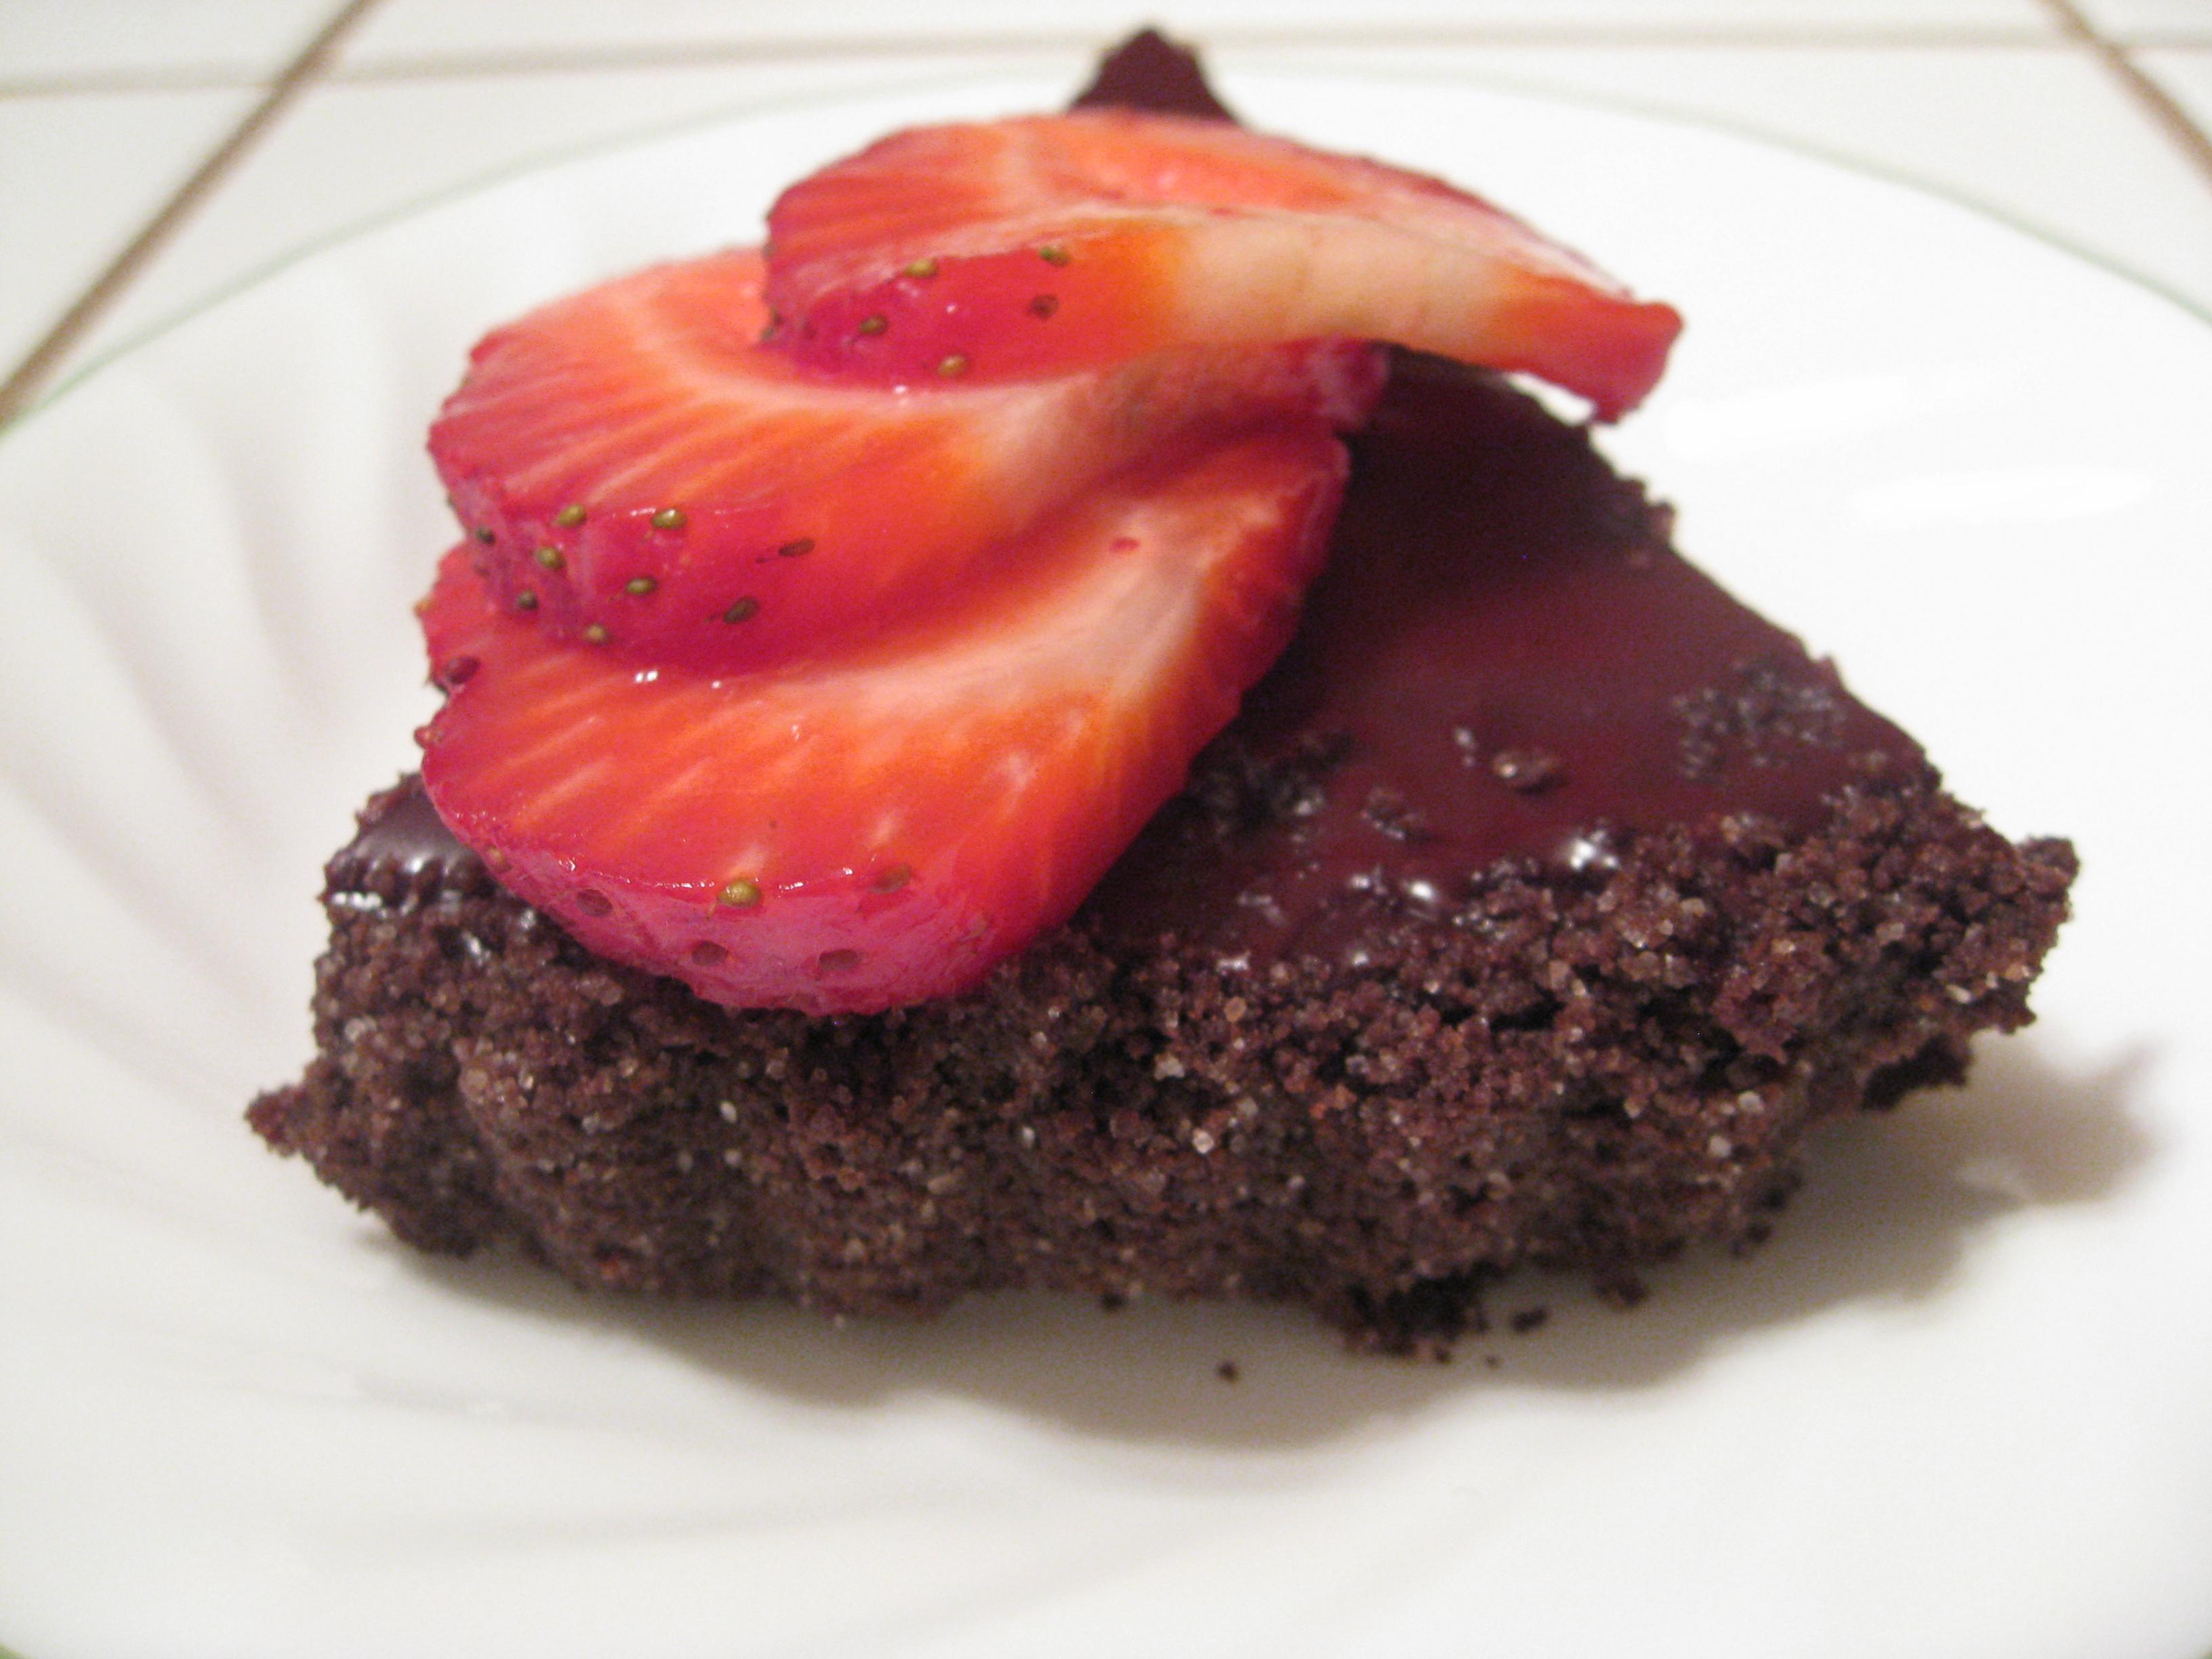 Chocolate Glazed Chocolate Tart with Strawberries